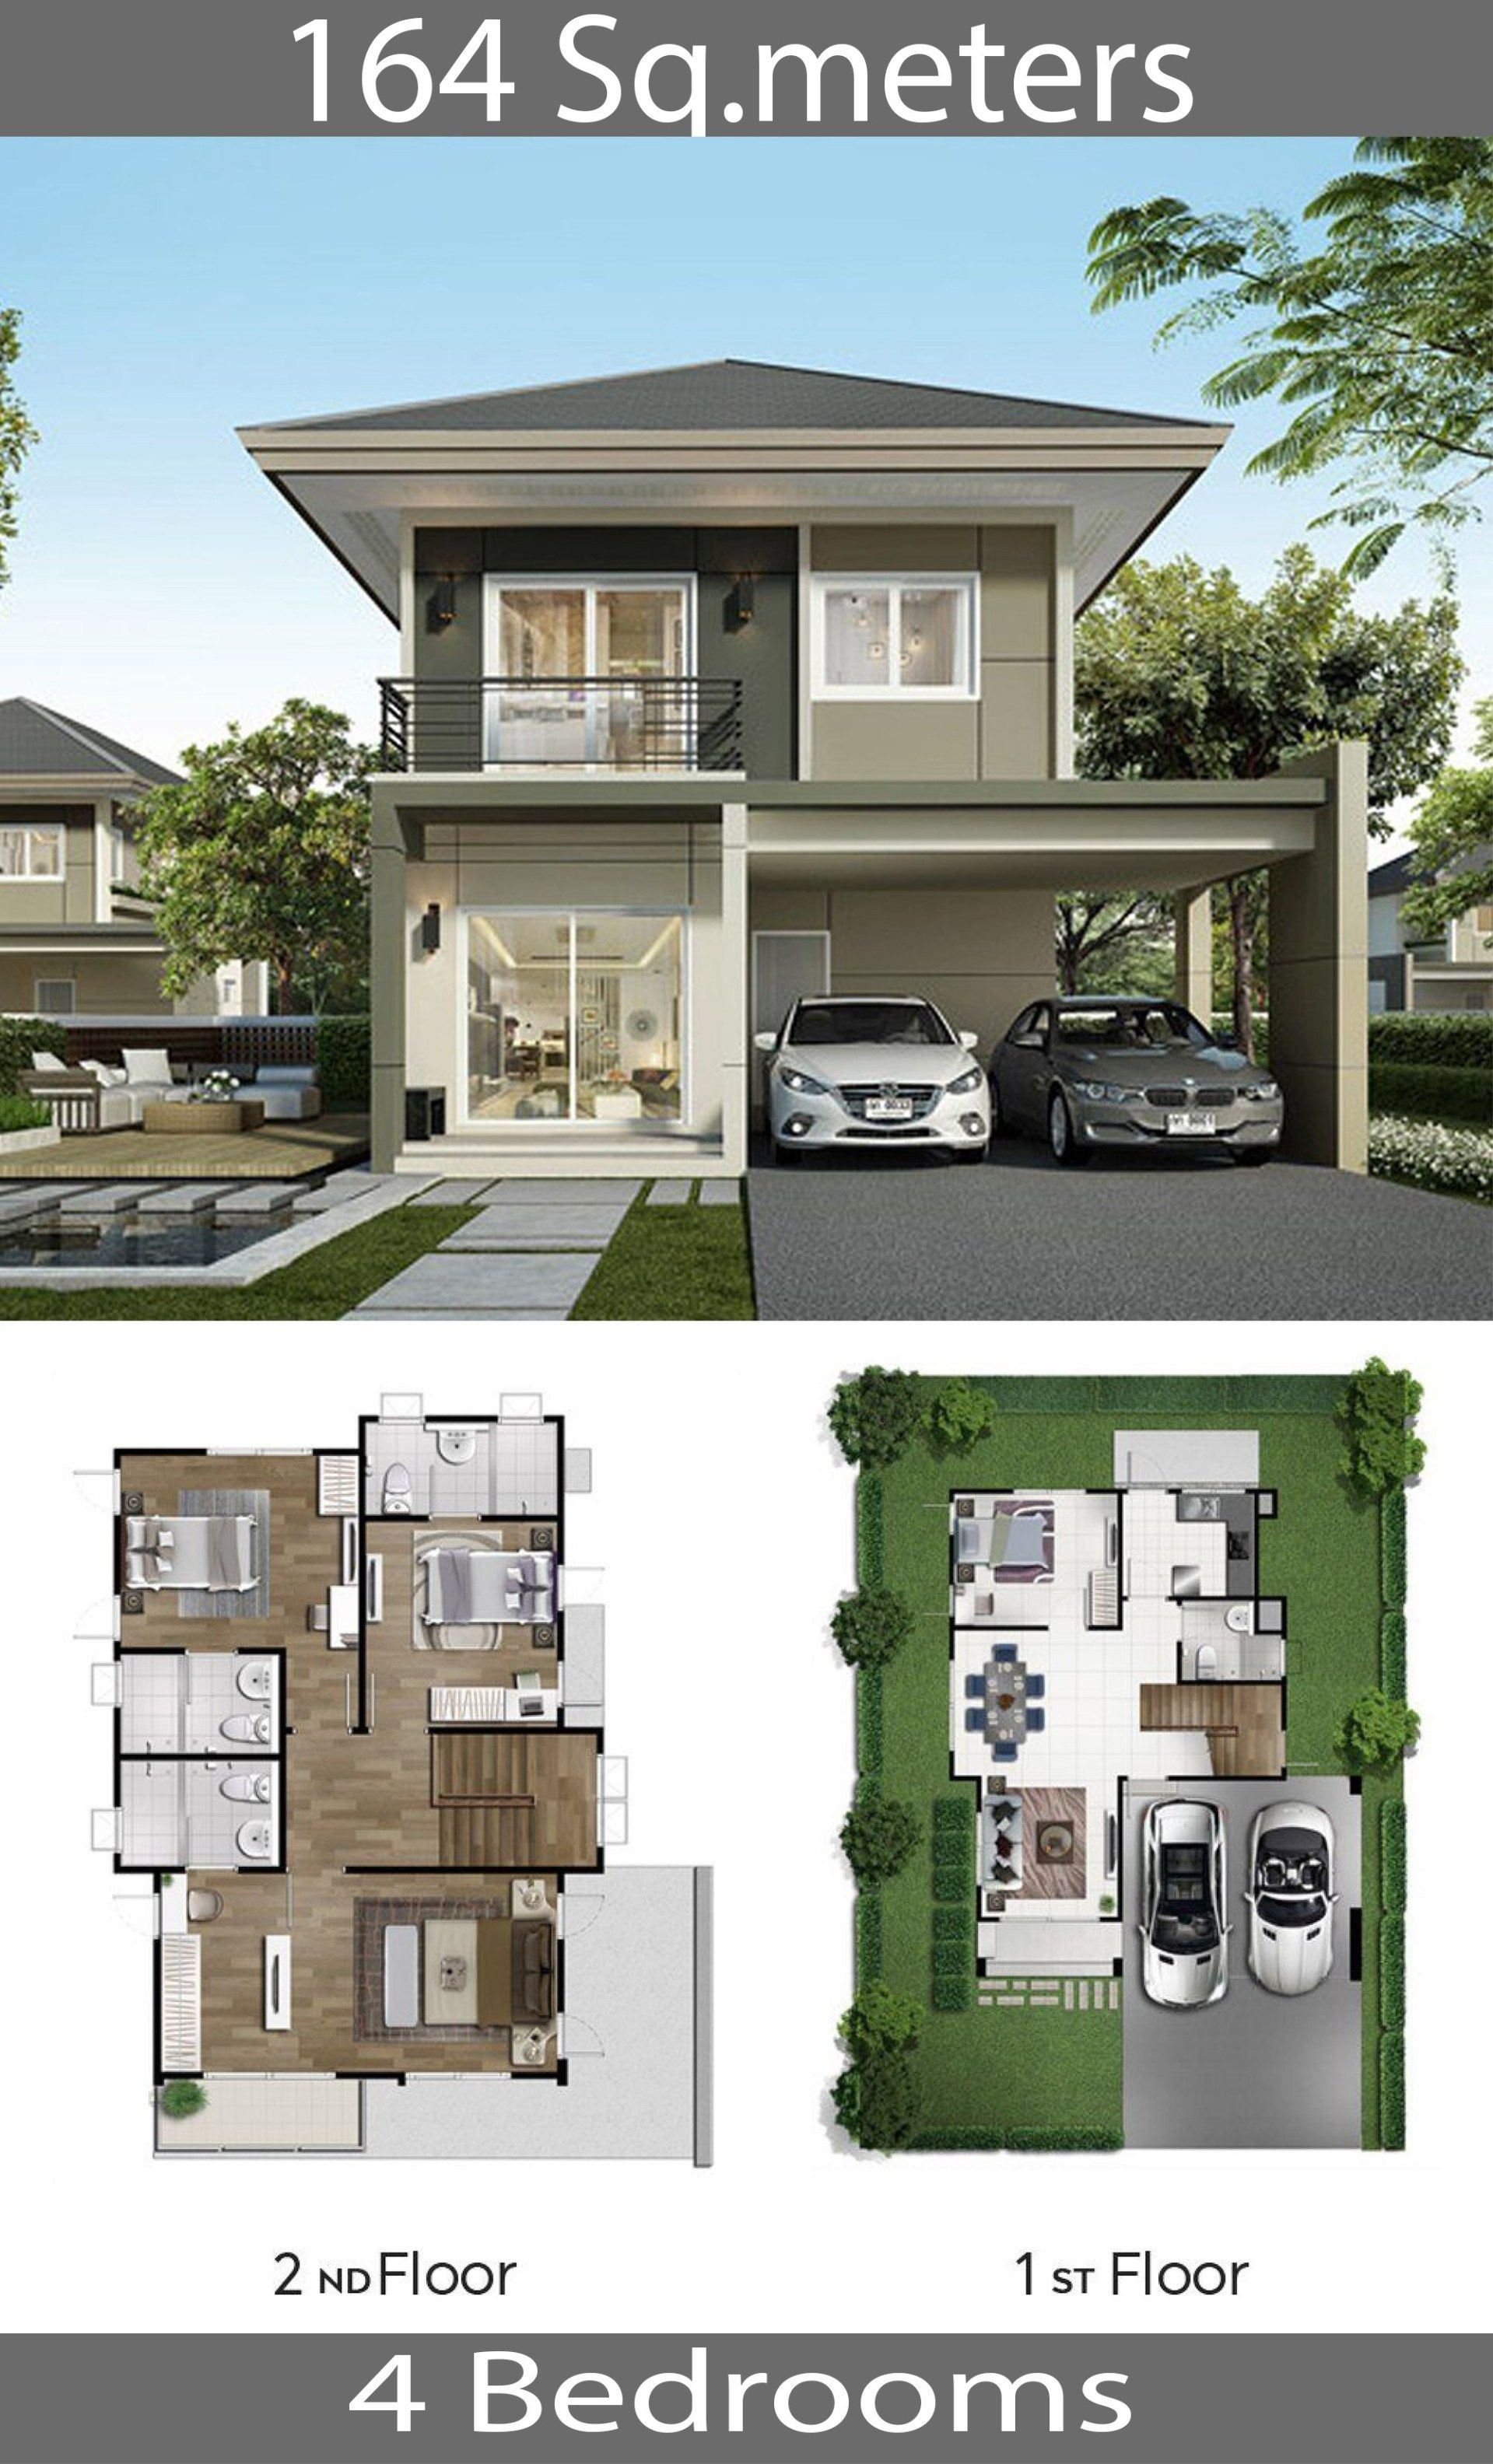 2 Storey Single Detached House 164 Sq M Home Ideas House Front Design Architect Design House 2 Storey House Design